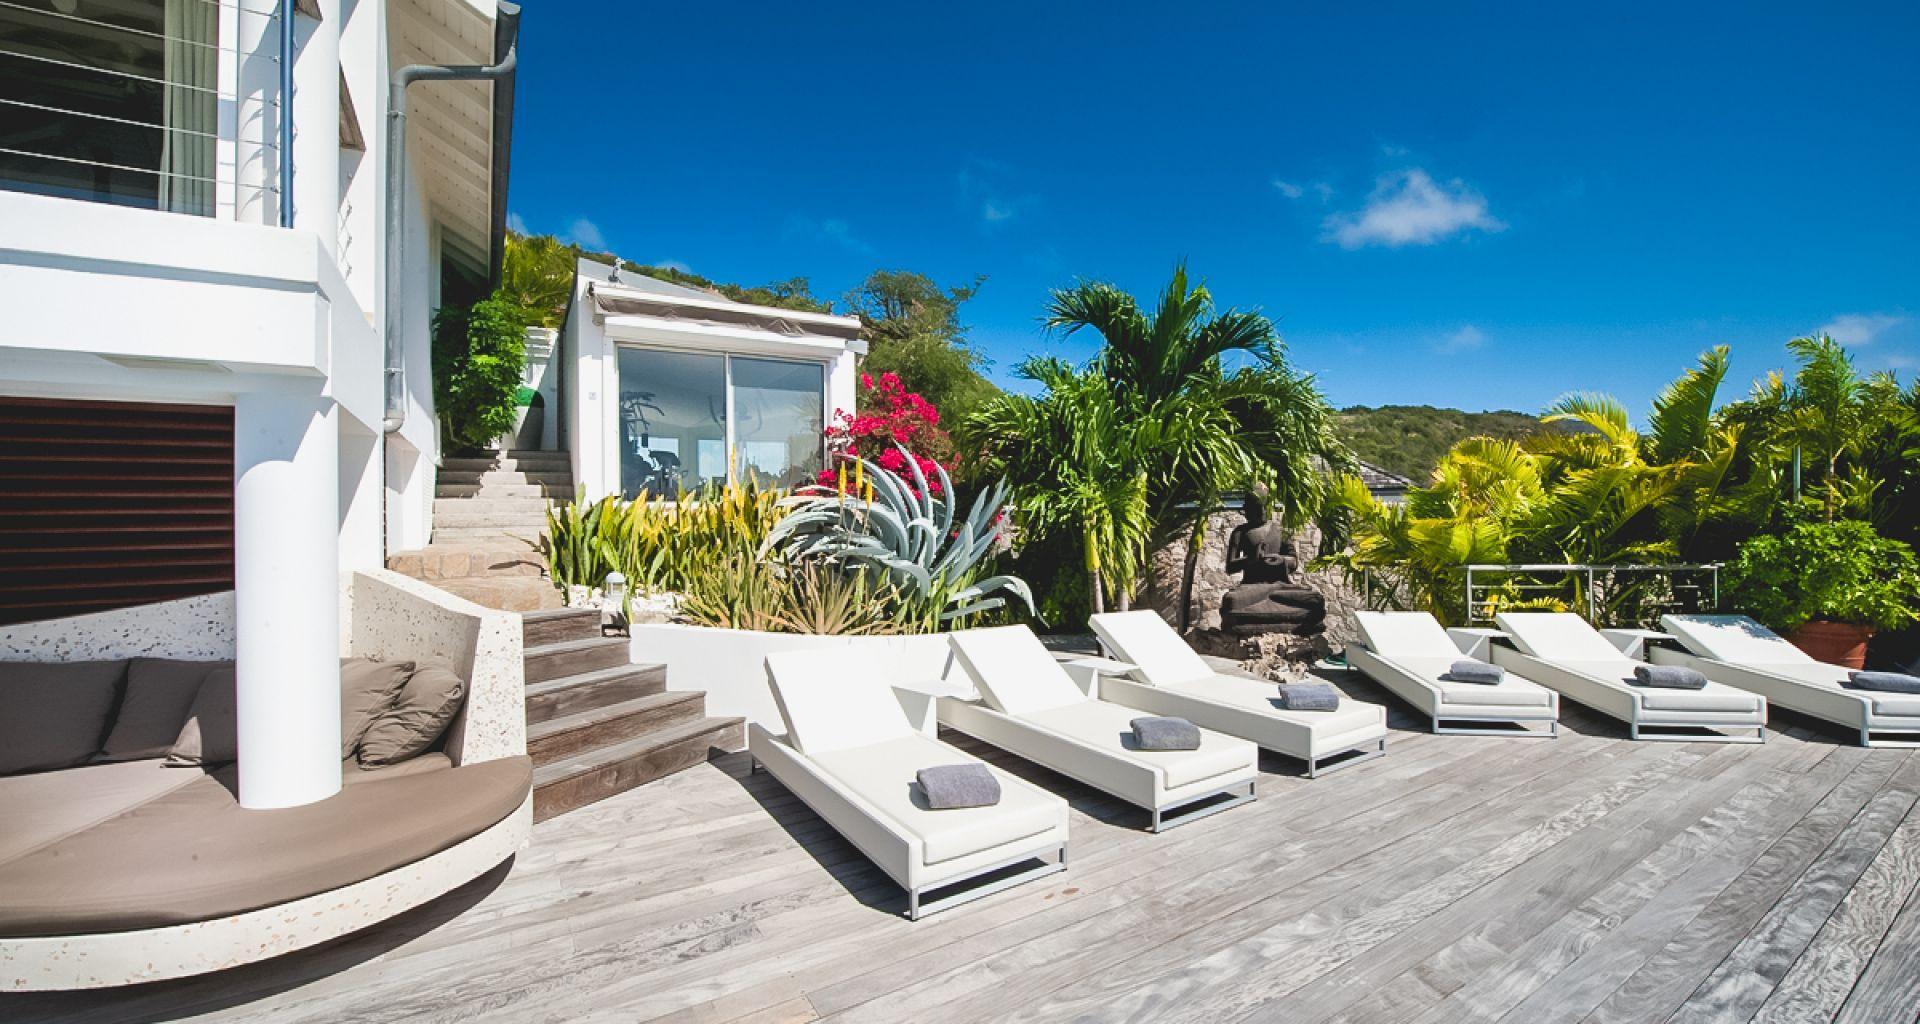 Villa Gouverneur Dream, St-Barts, Caribbean